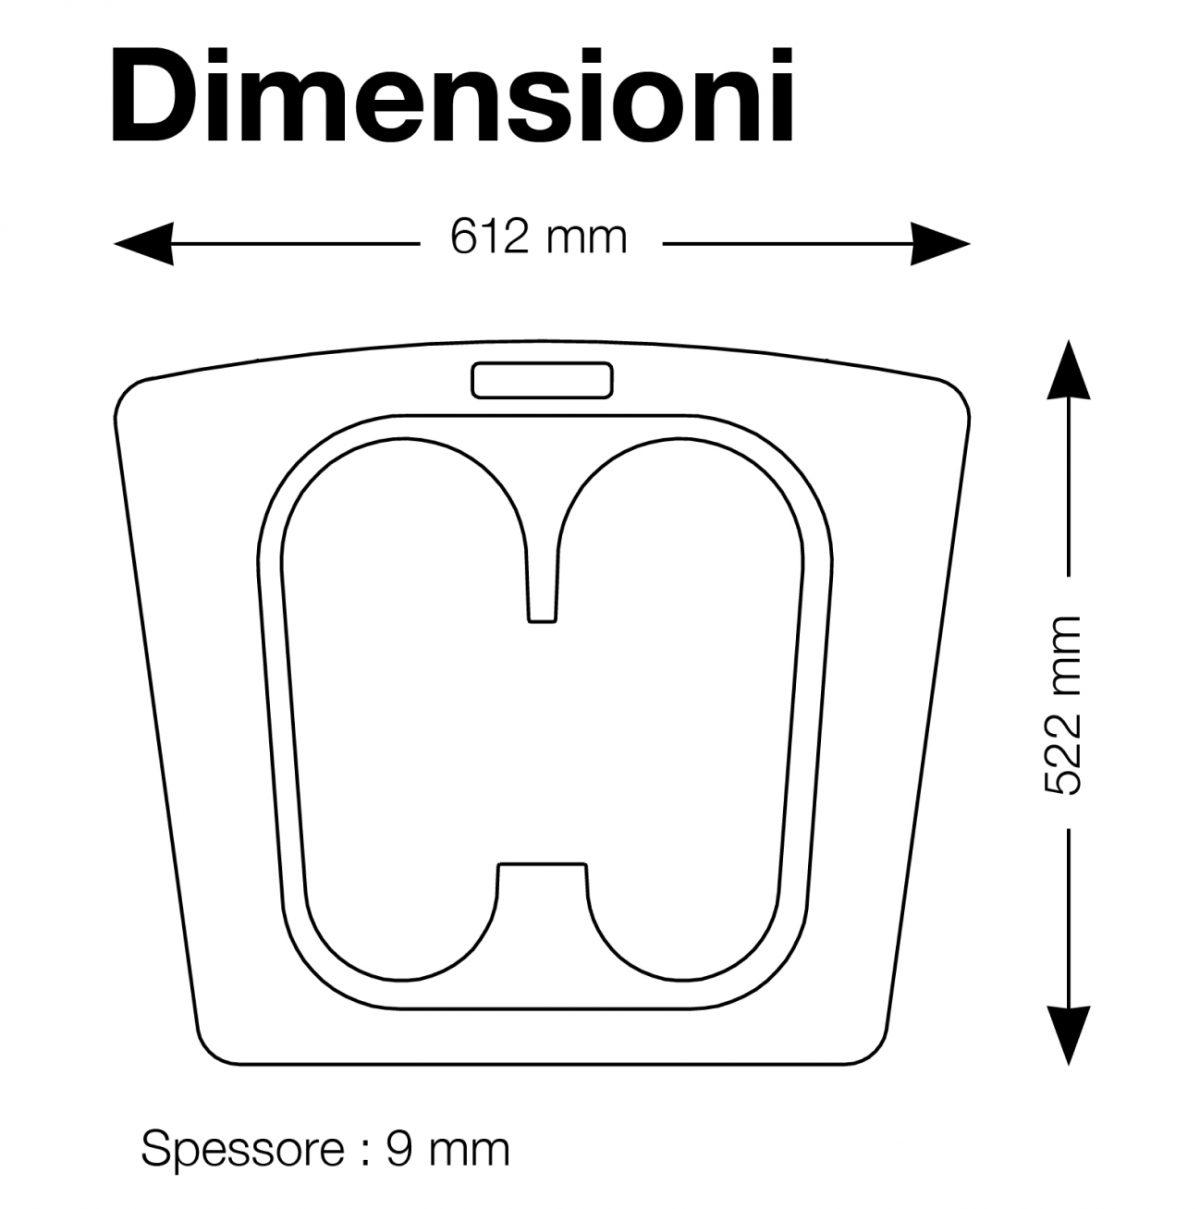 Dimensioni tappeto VioMat